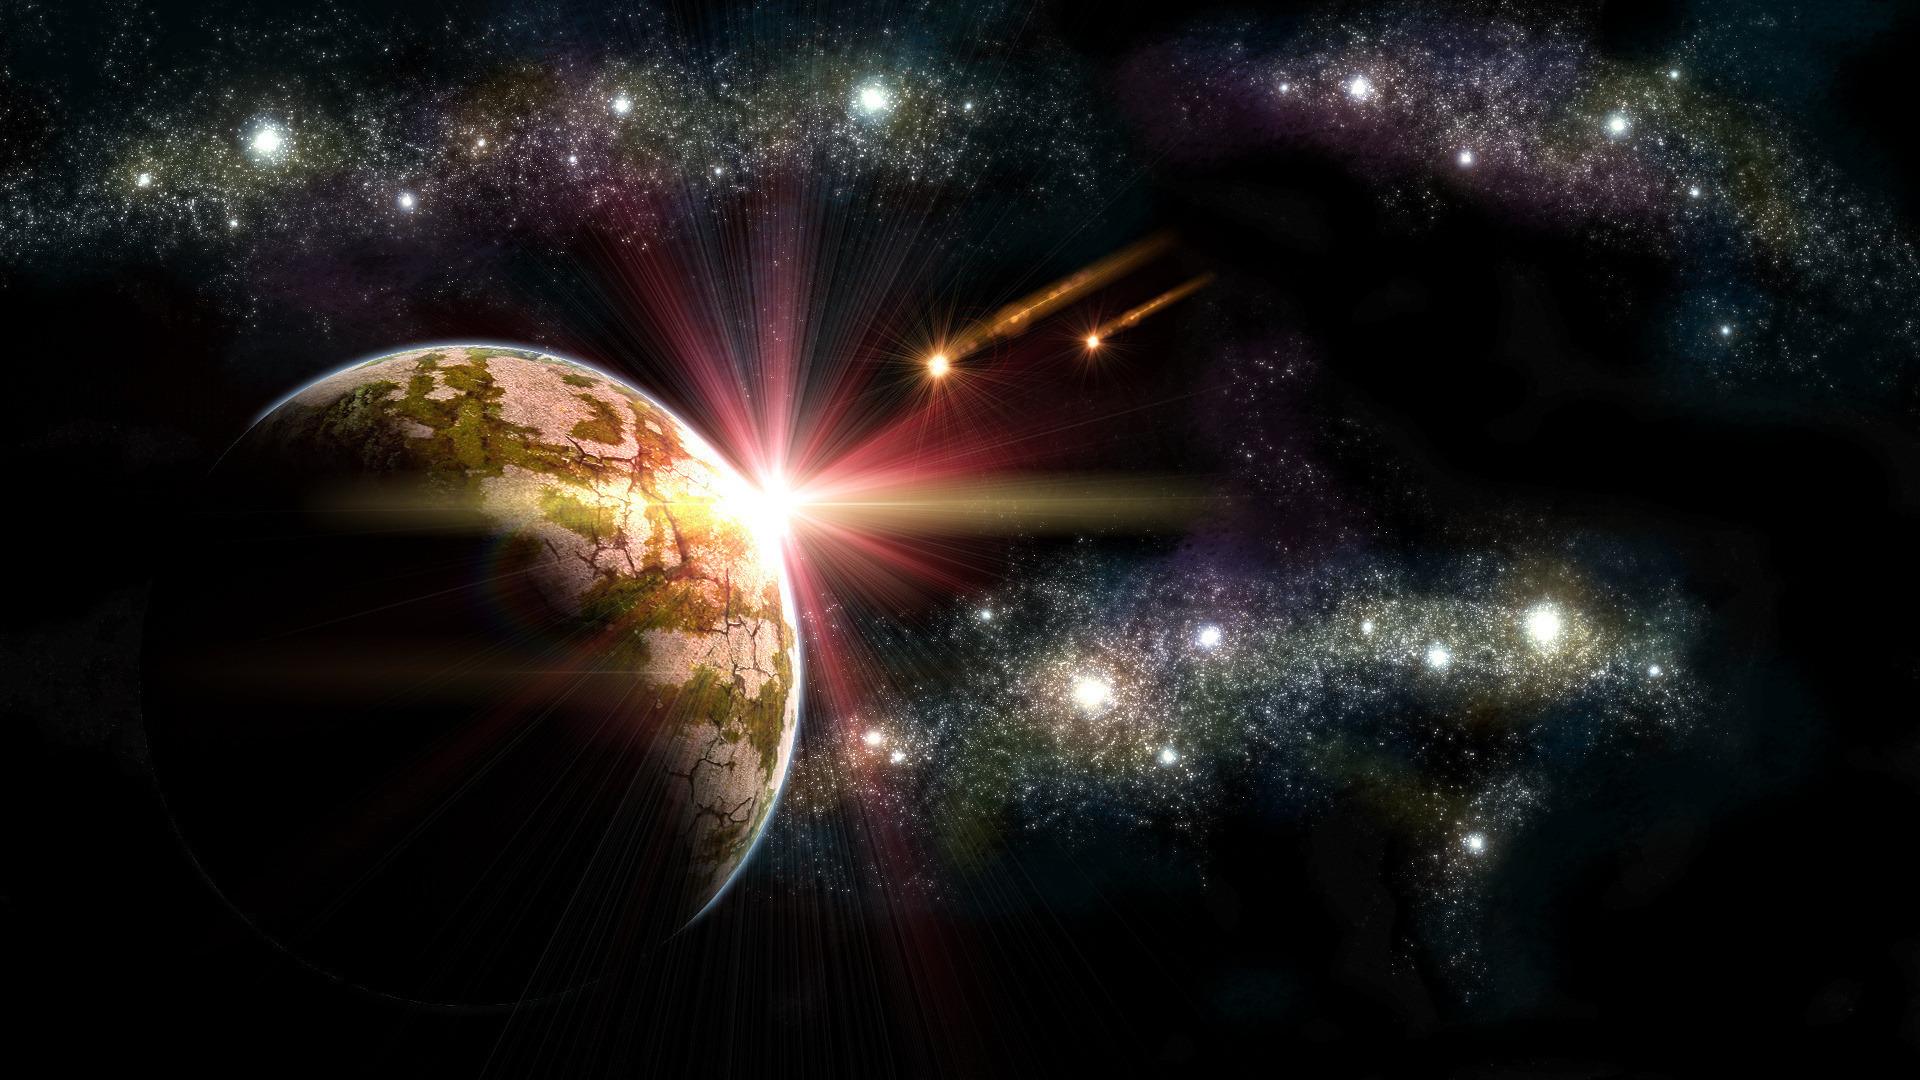 Камни на фоне звезд млечного пути загрузить